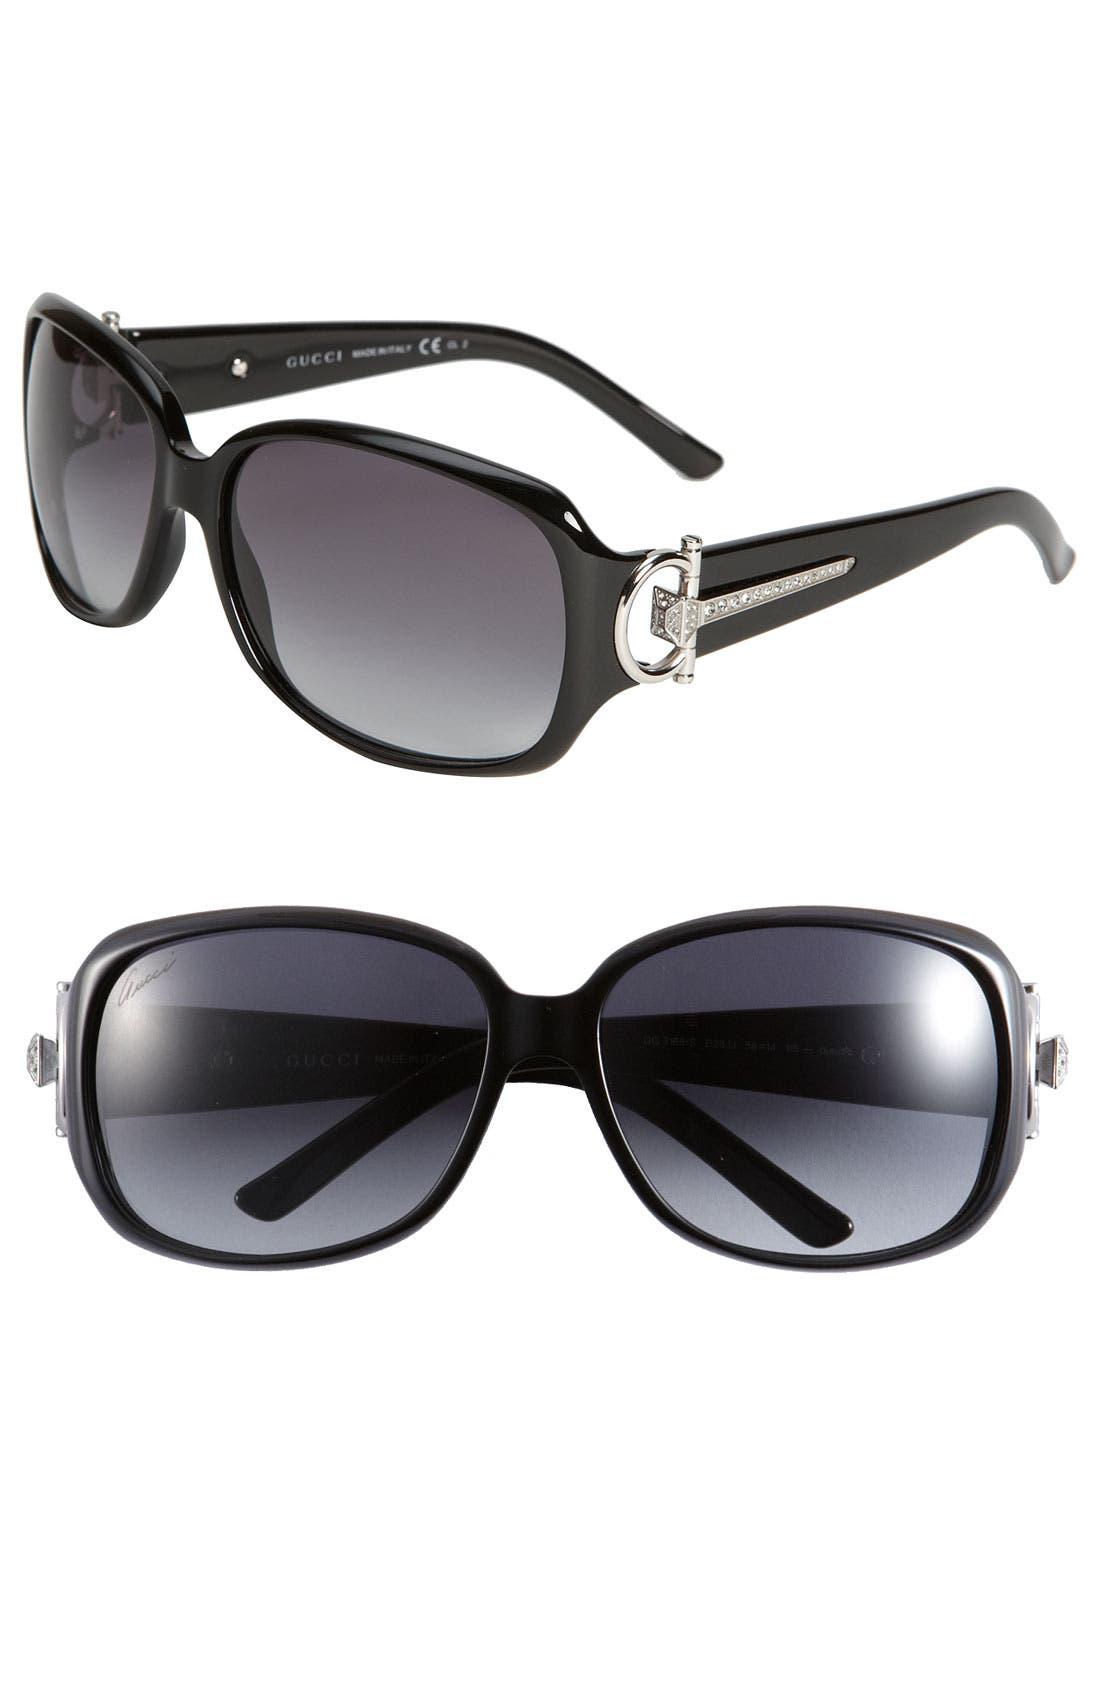 Main Image - Gucci 58mm Oversized Square Sunglasses